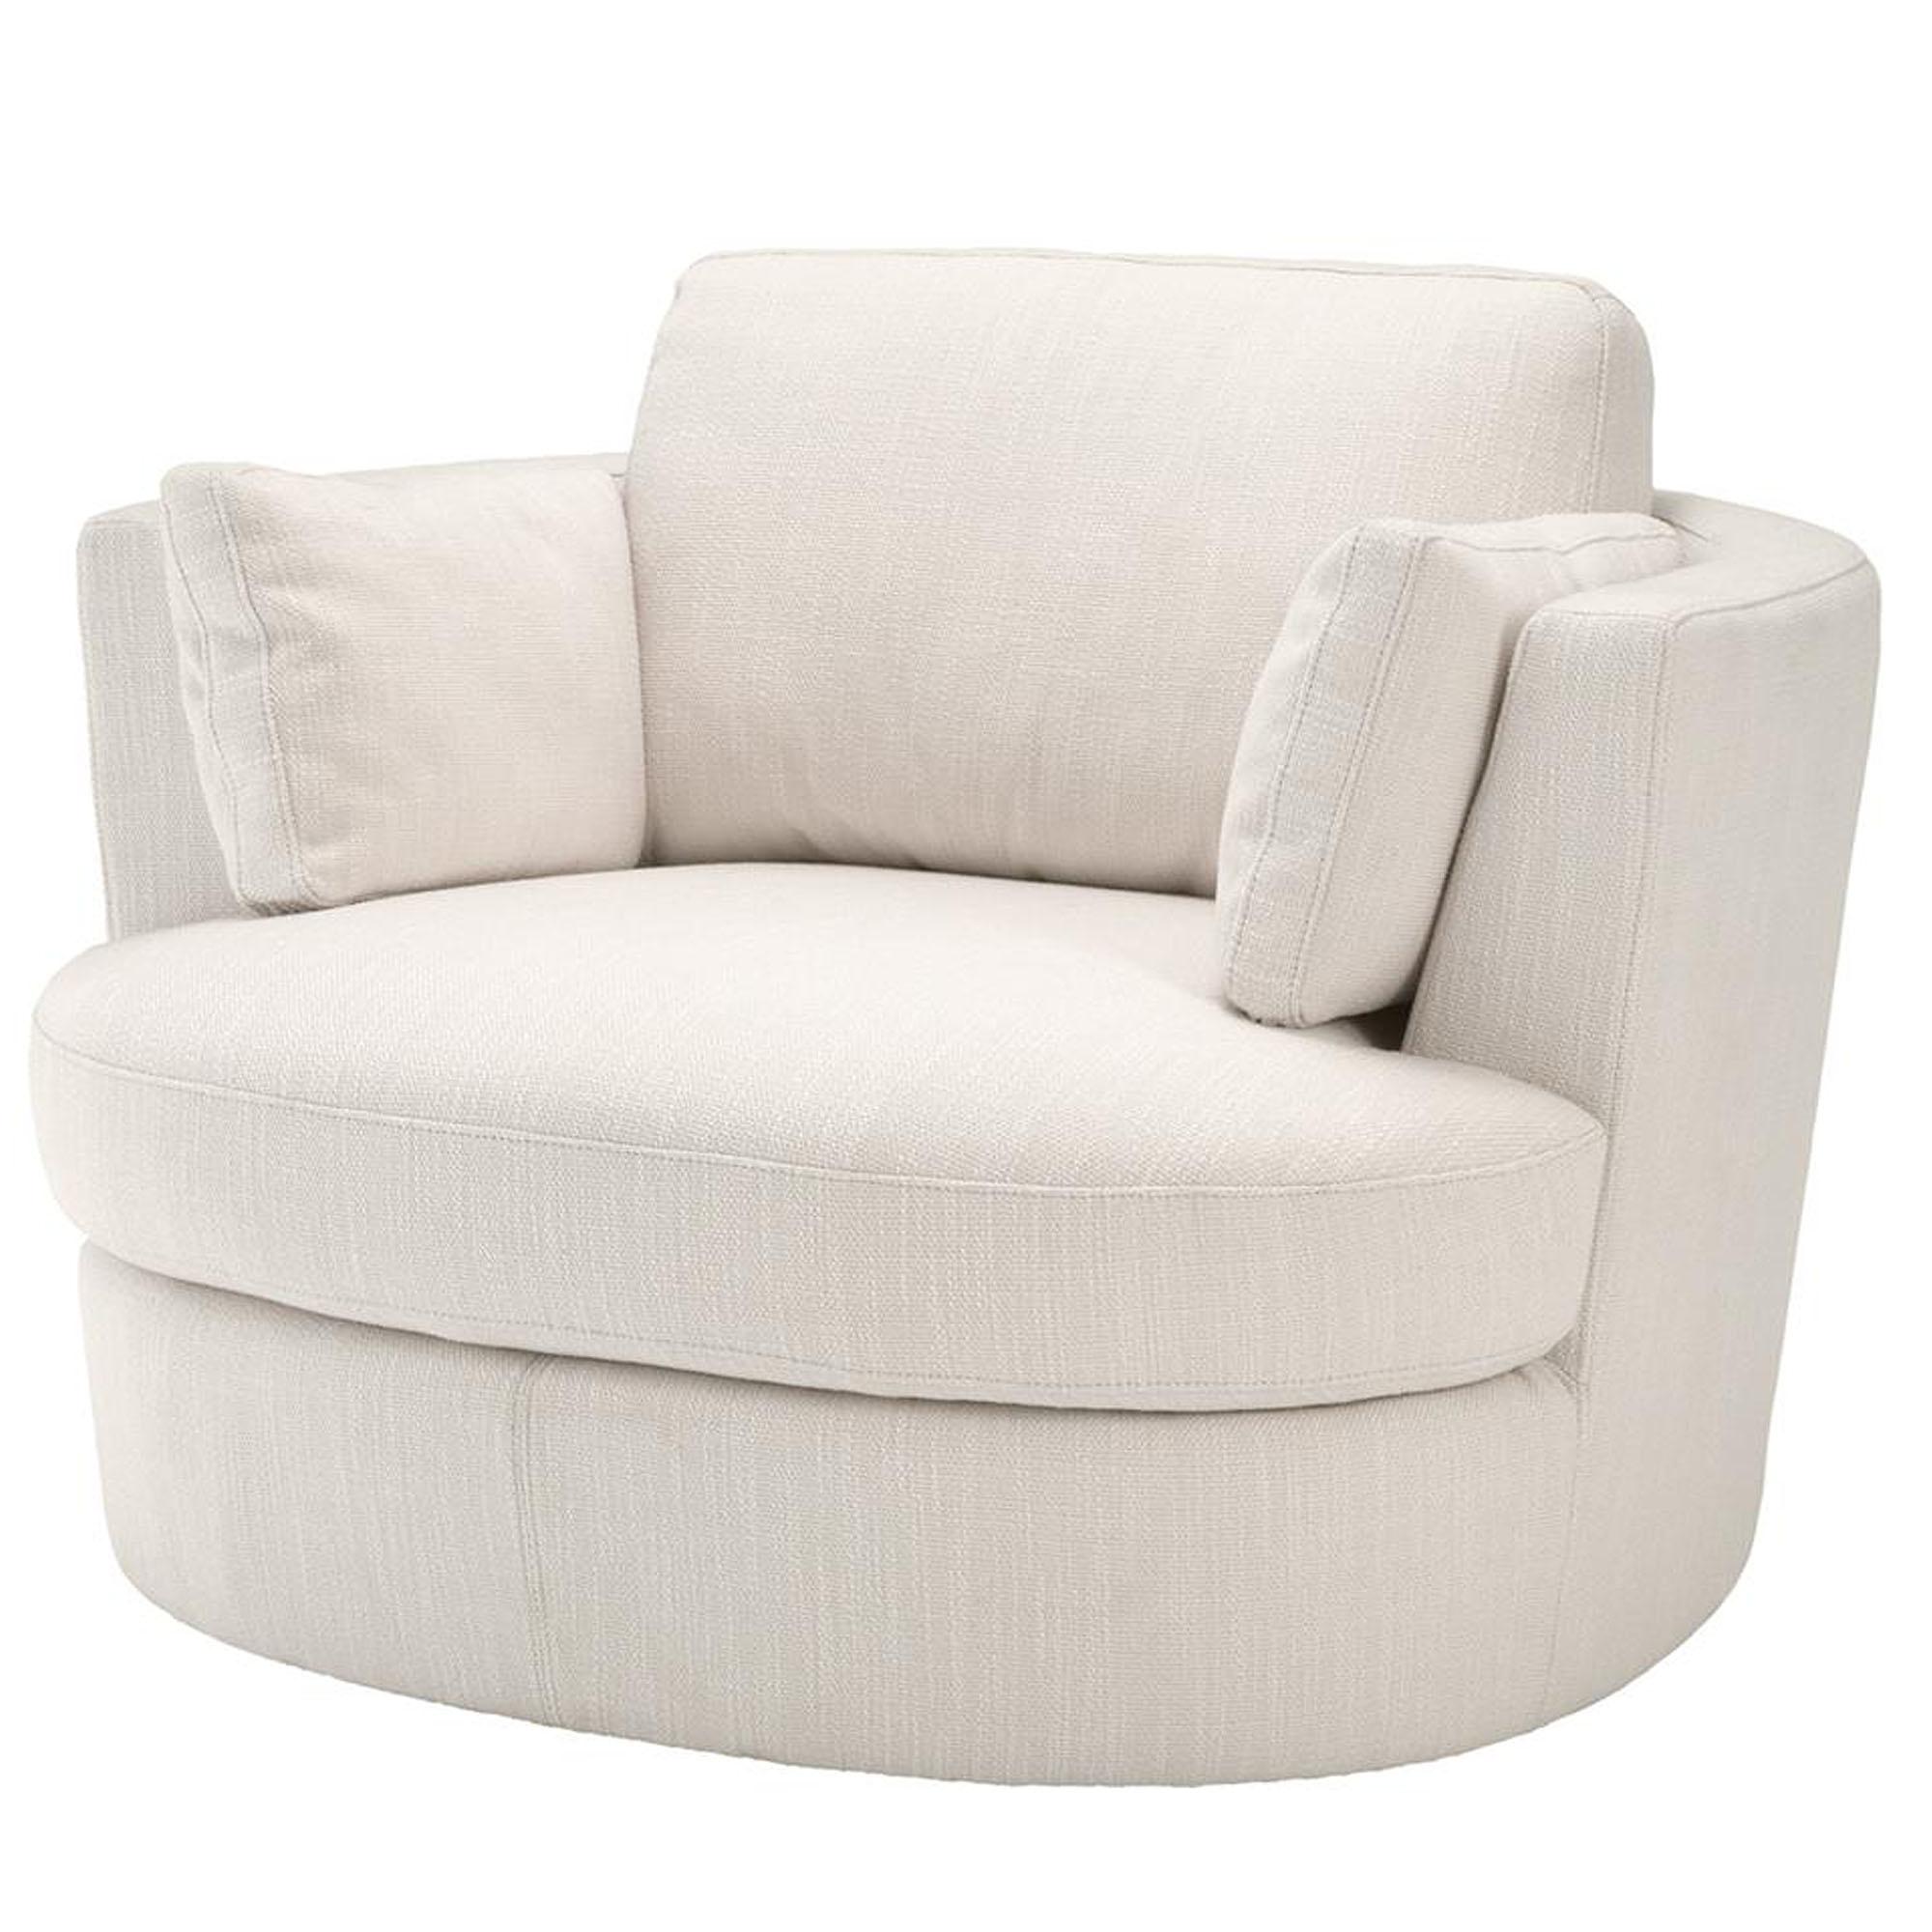 Witte Draai Fauteuil.Ronde Witte Draai Fauteuil Eichholtz Swivel Chair Clarissa